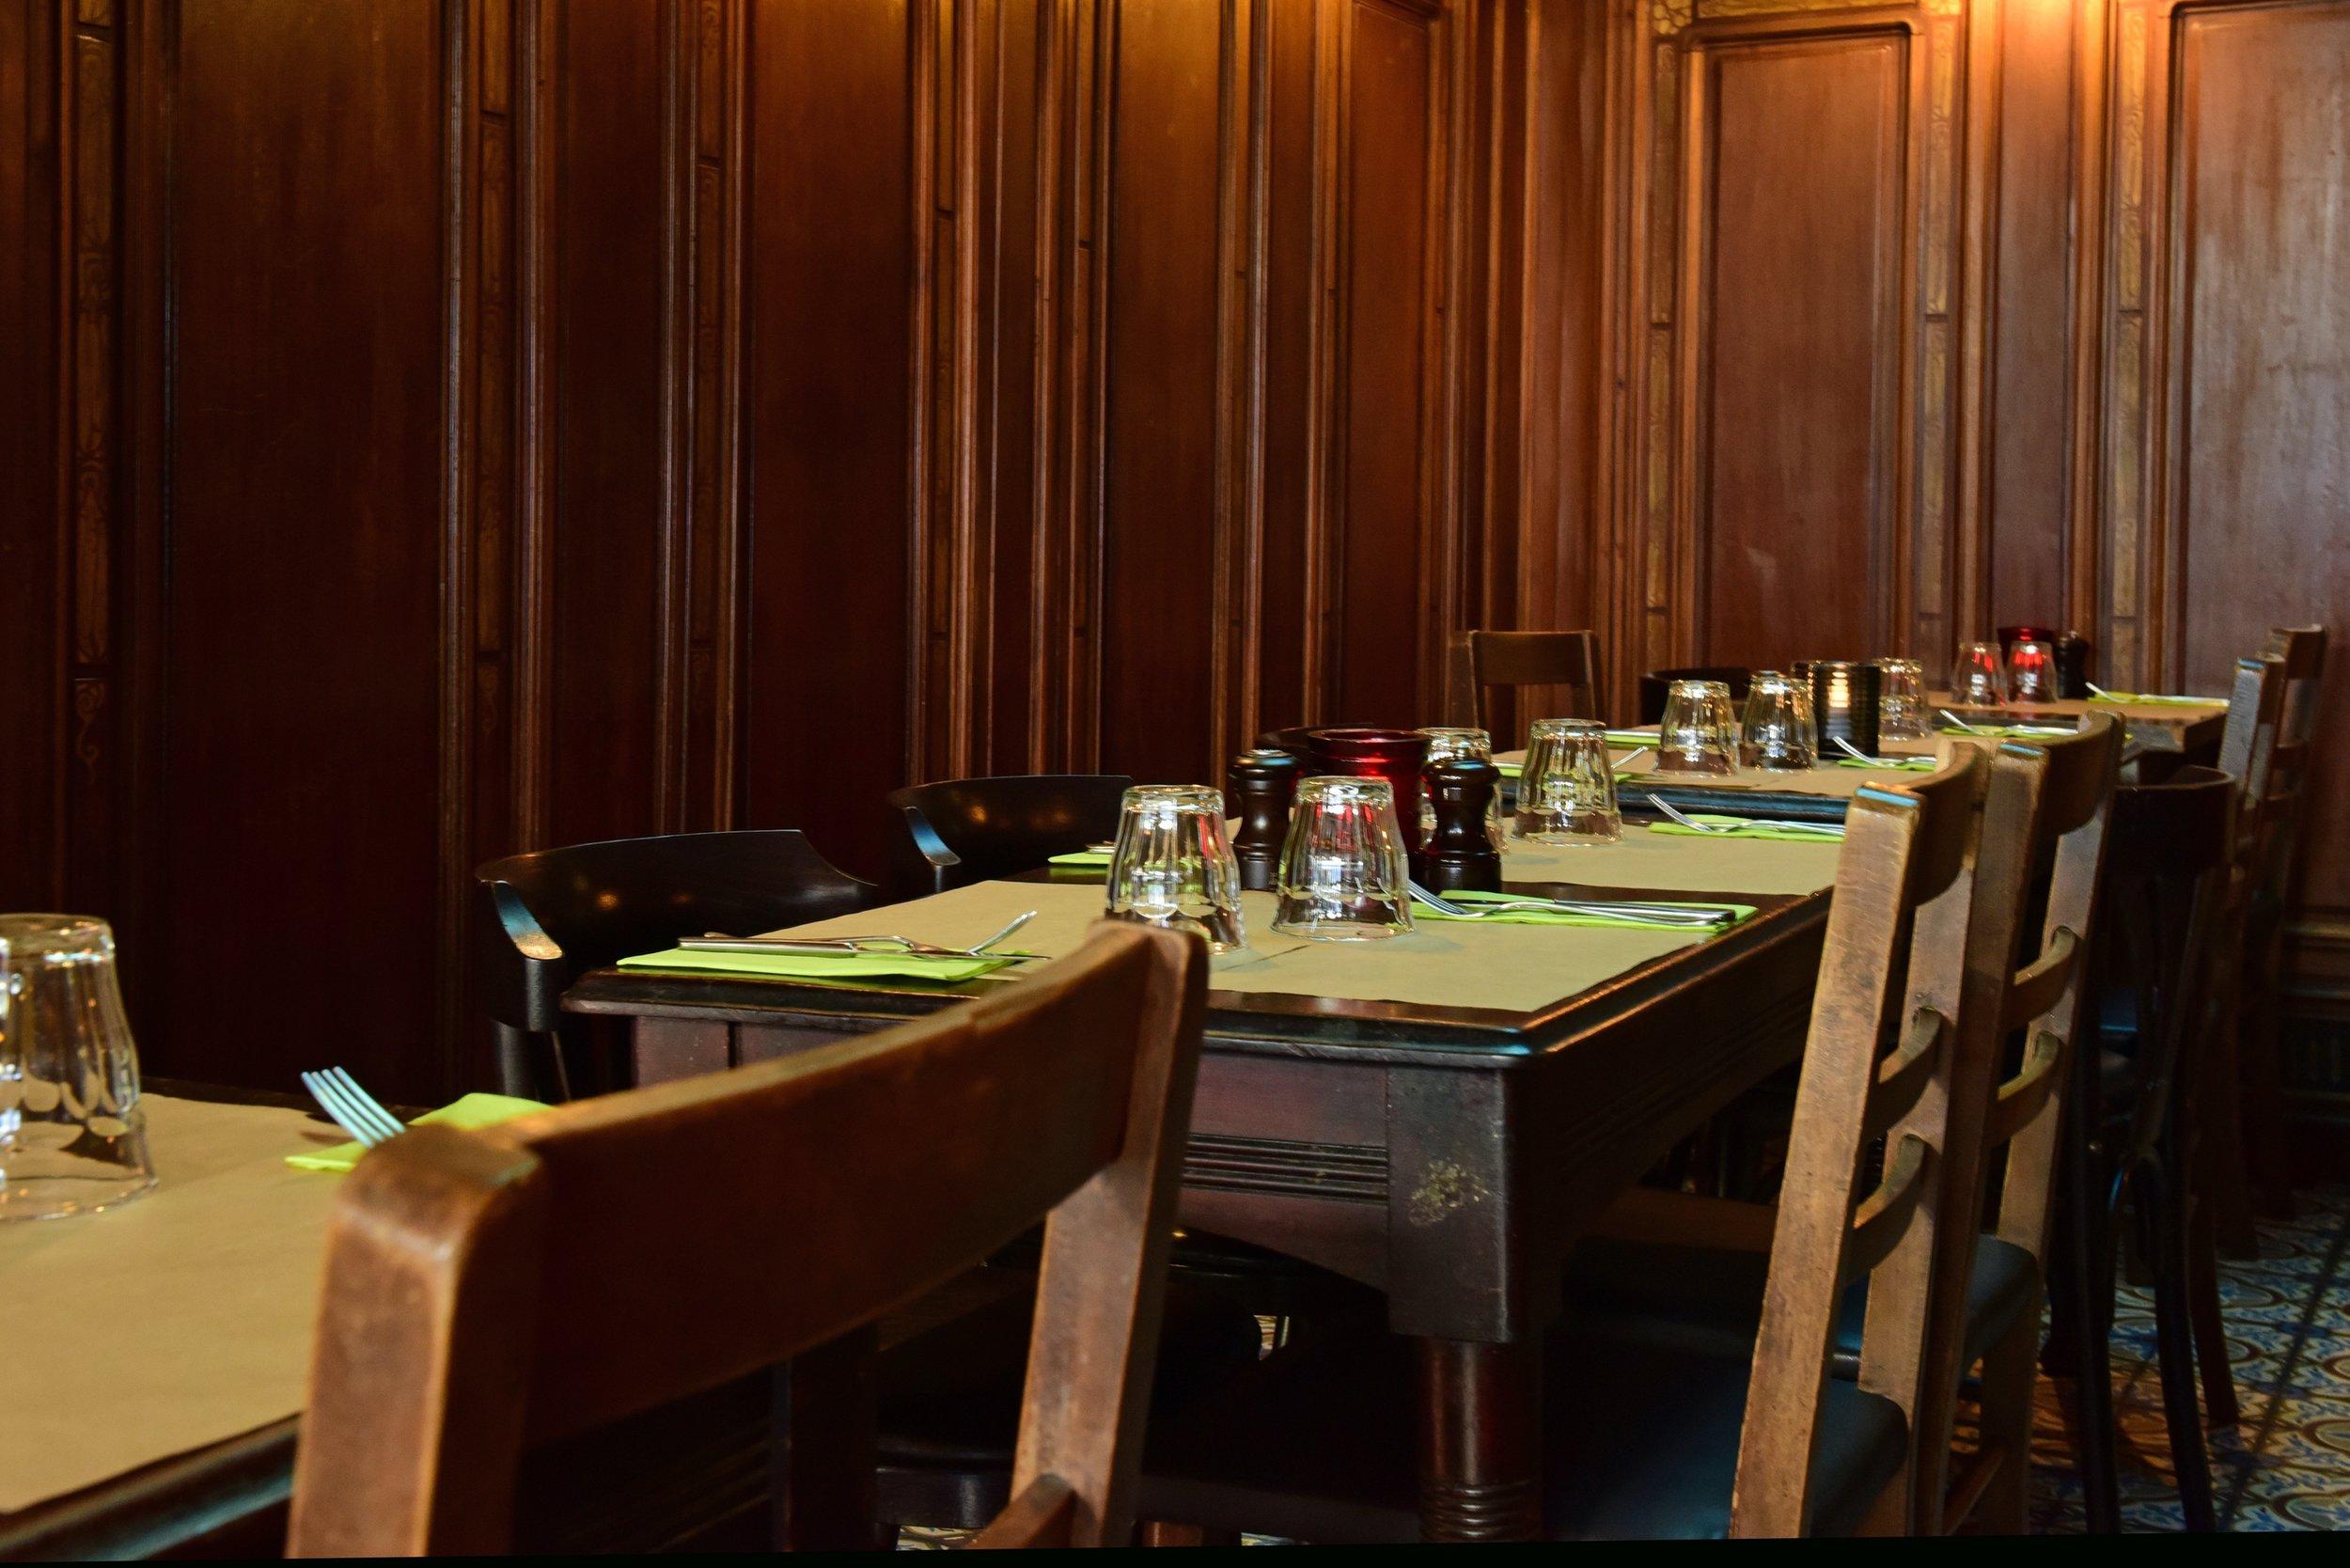 3 la pipe d anvers antwerpen brasserie antwerp best restaurant tablefever.jpg